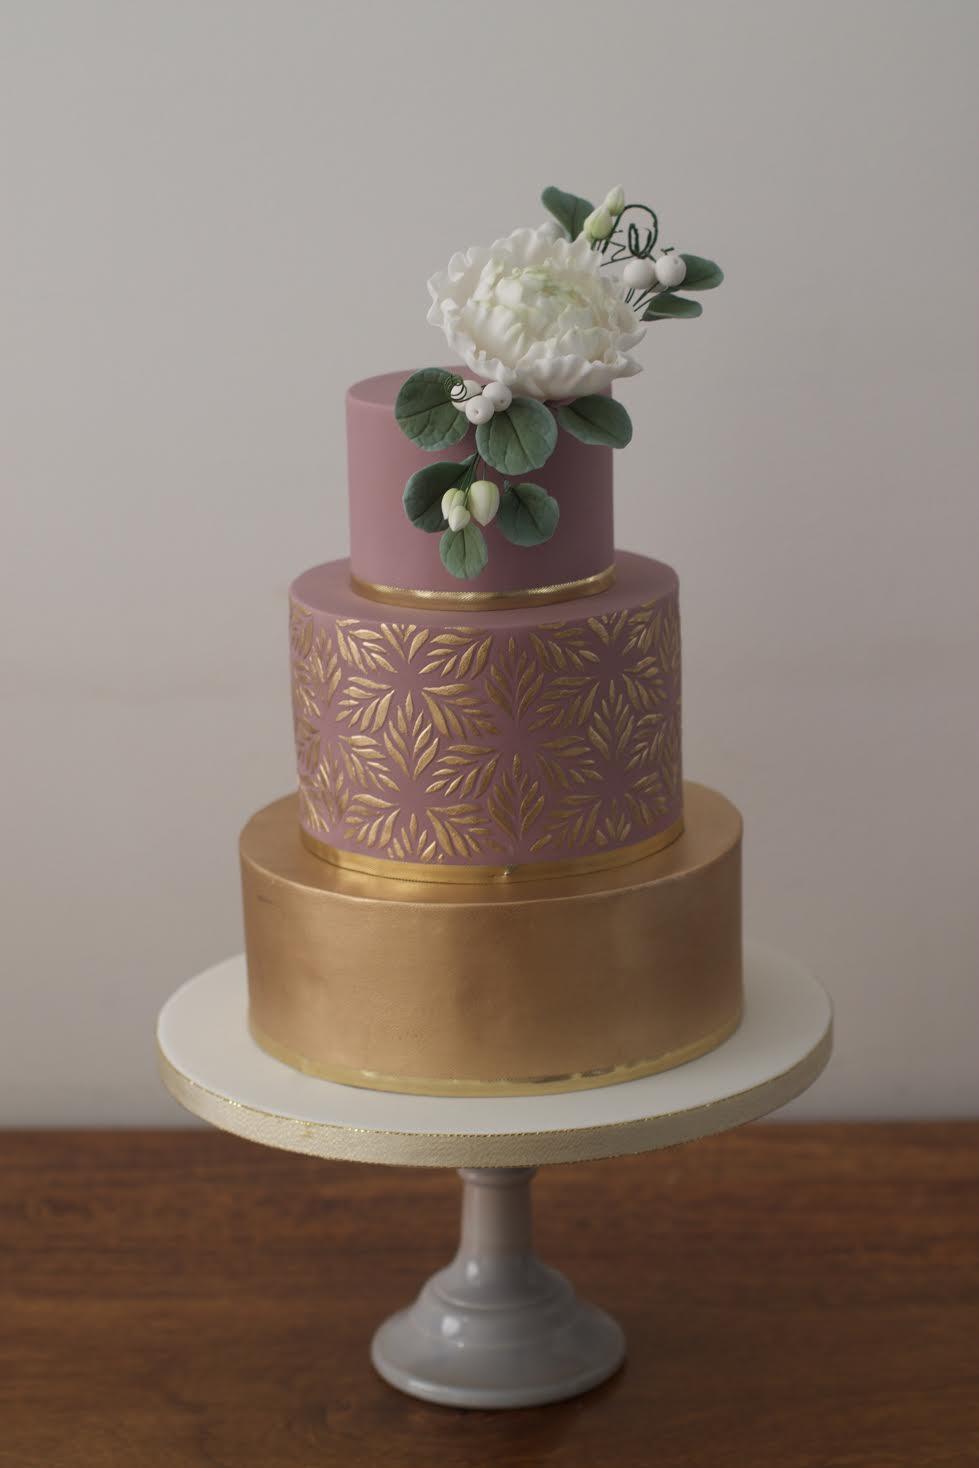 Cake Decorating Supplies Wholesale